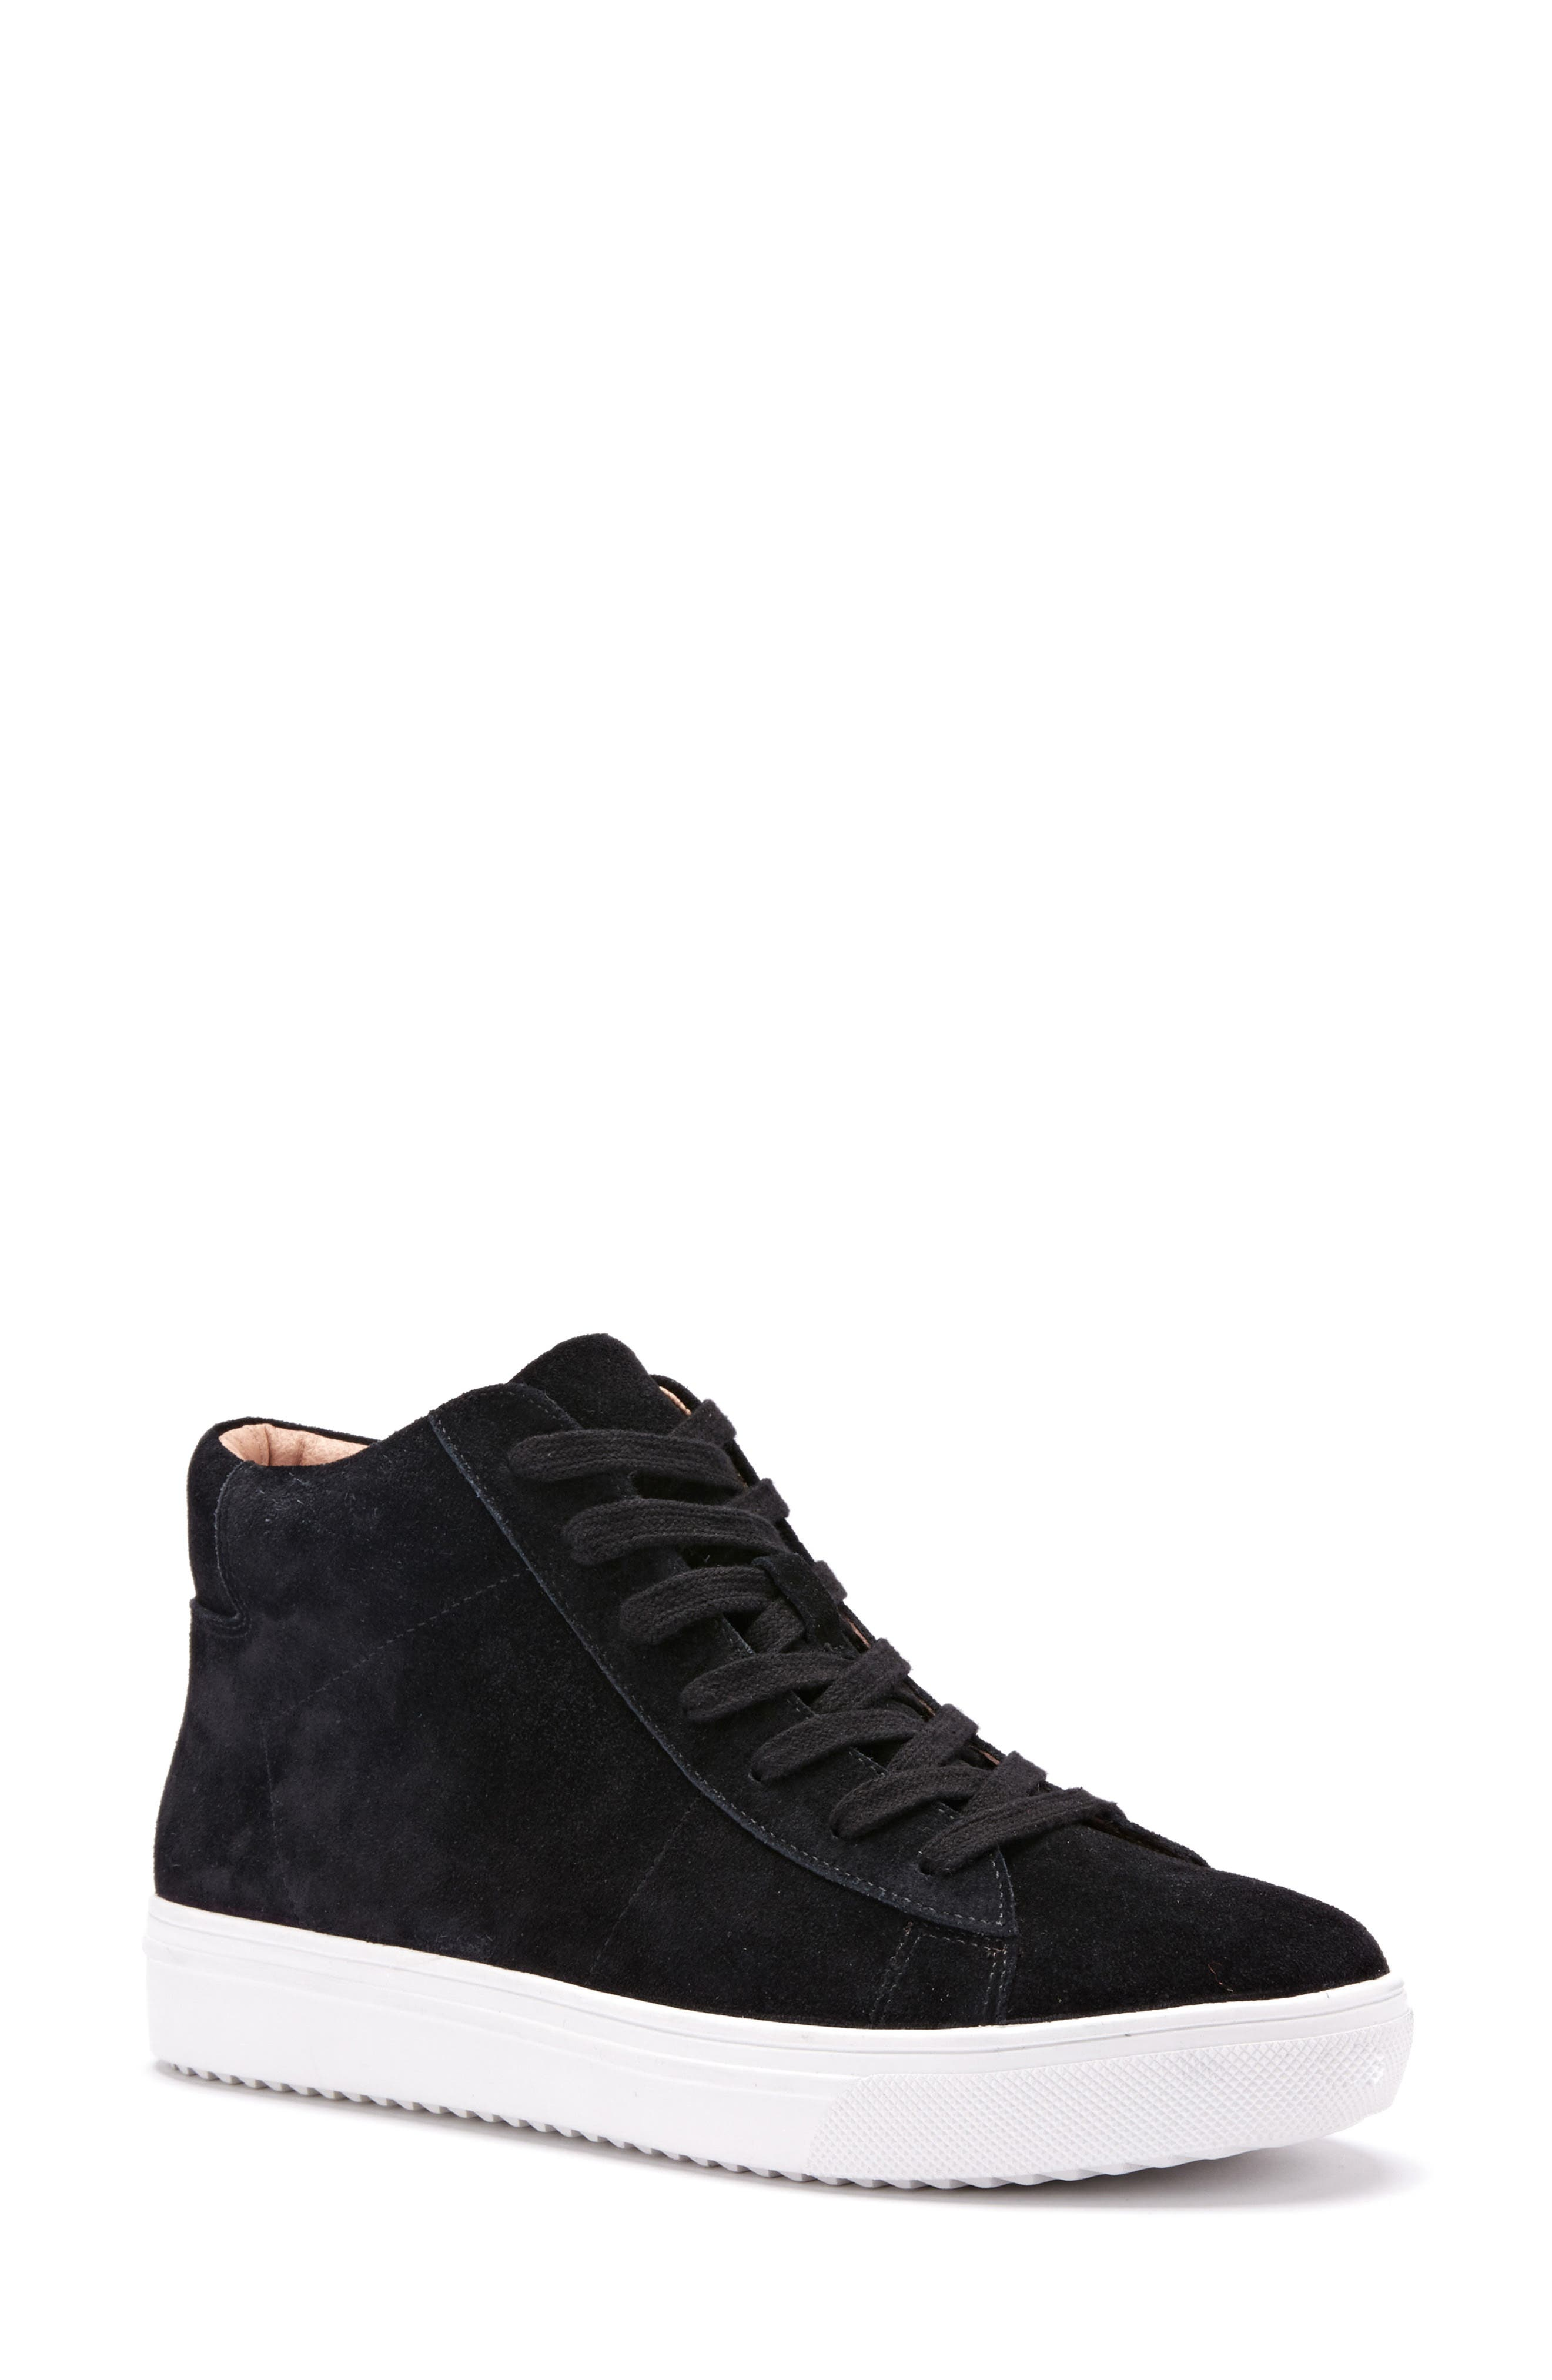 Jax Waterproof High Top Sneaker,                             Main thumbnail 3, color,